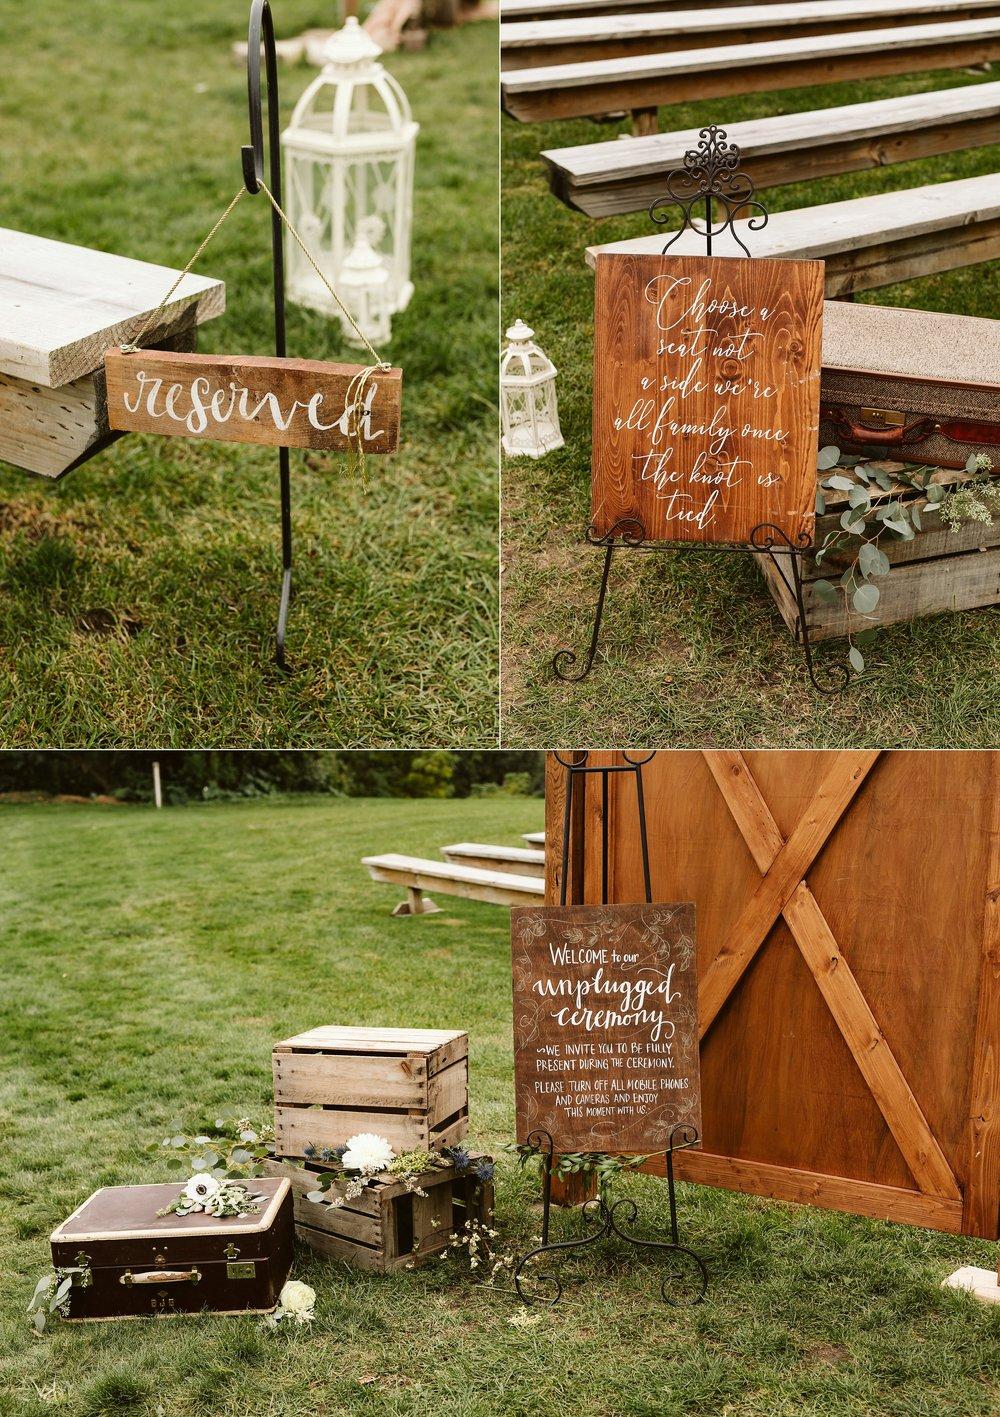 john-p-furber-farm-wedding-in-september-blush-and-coral-flowers-138.jpg